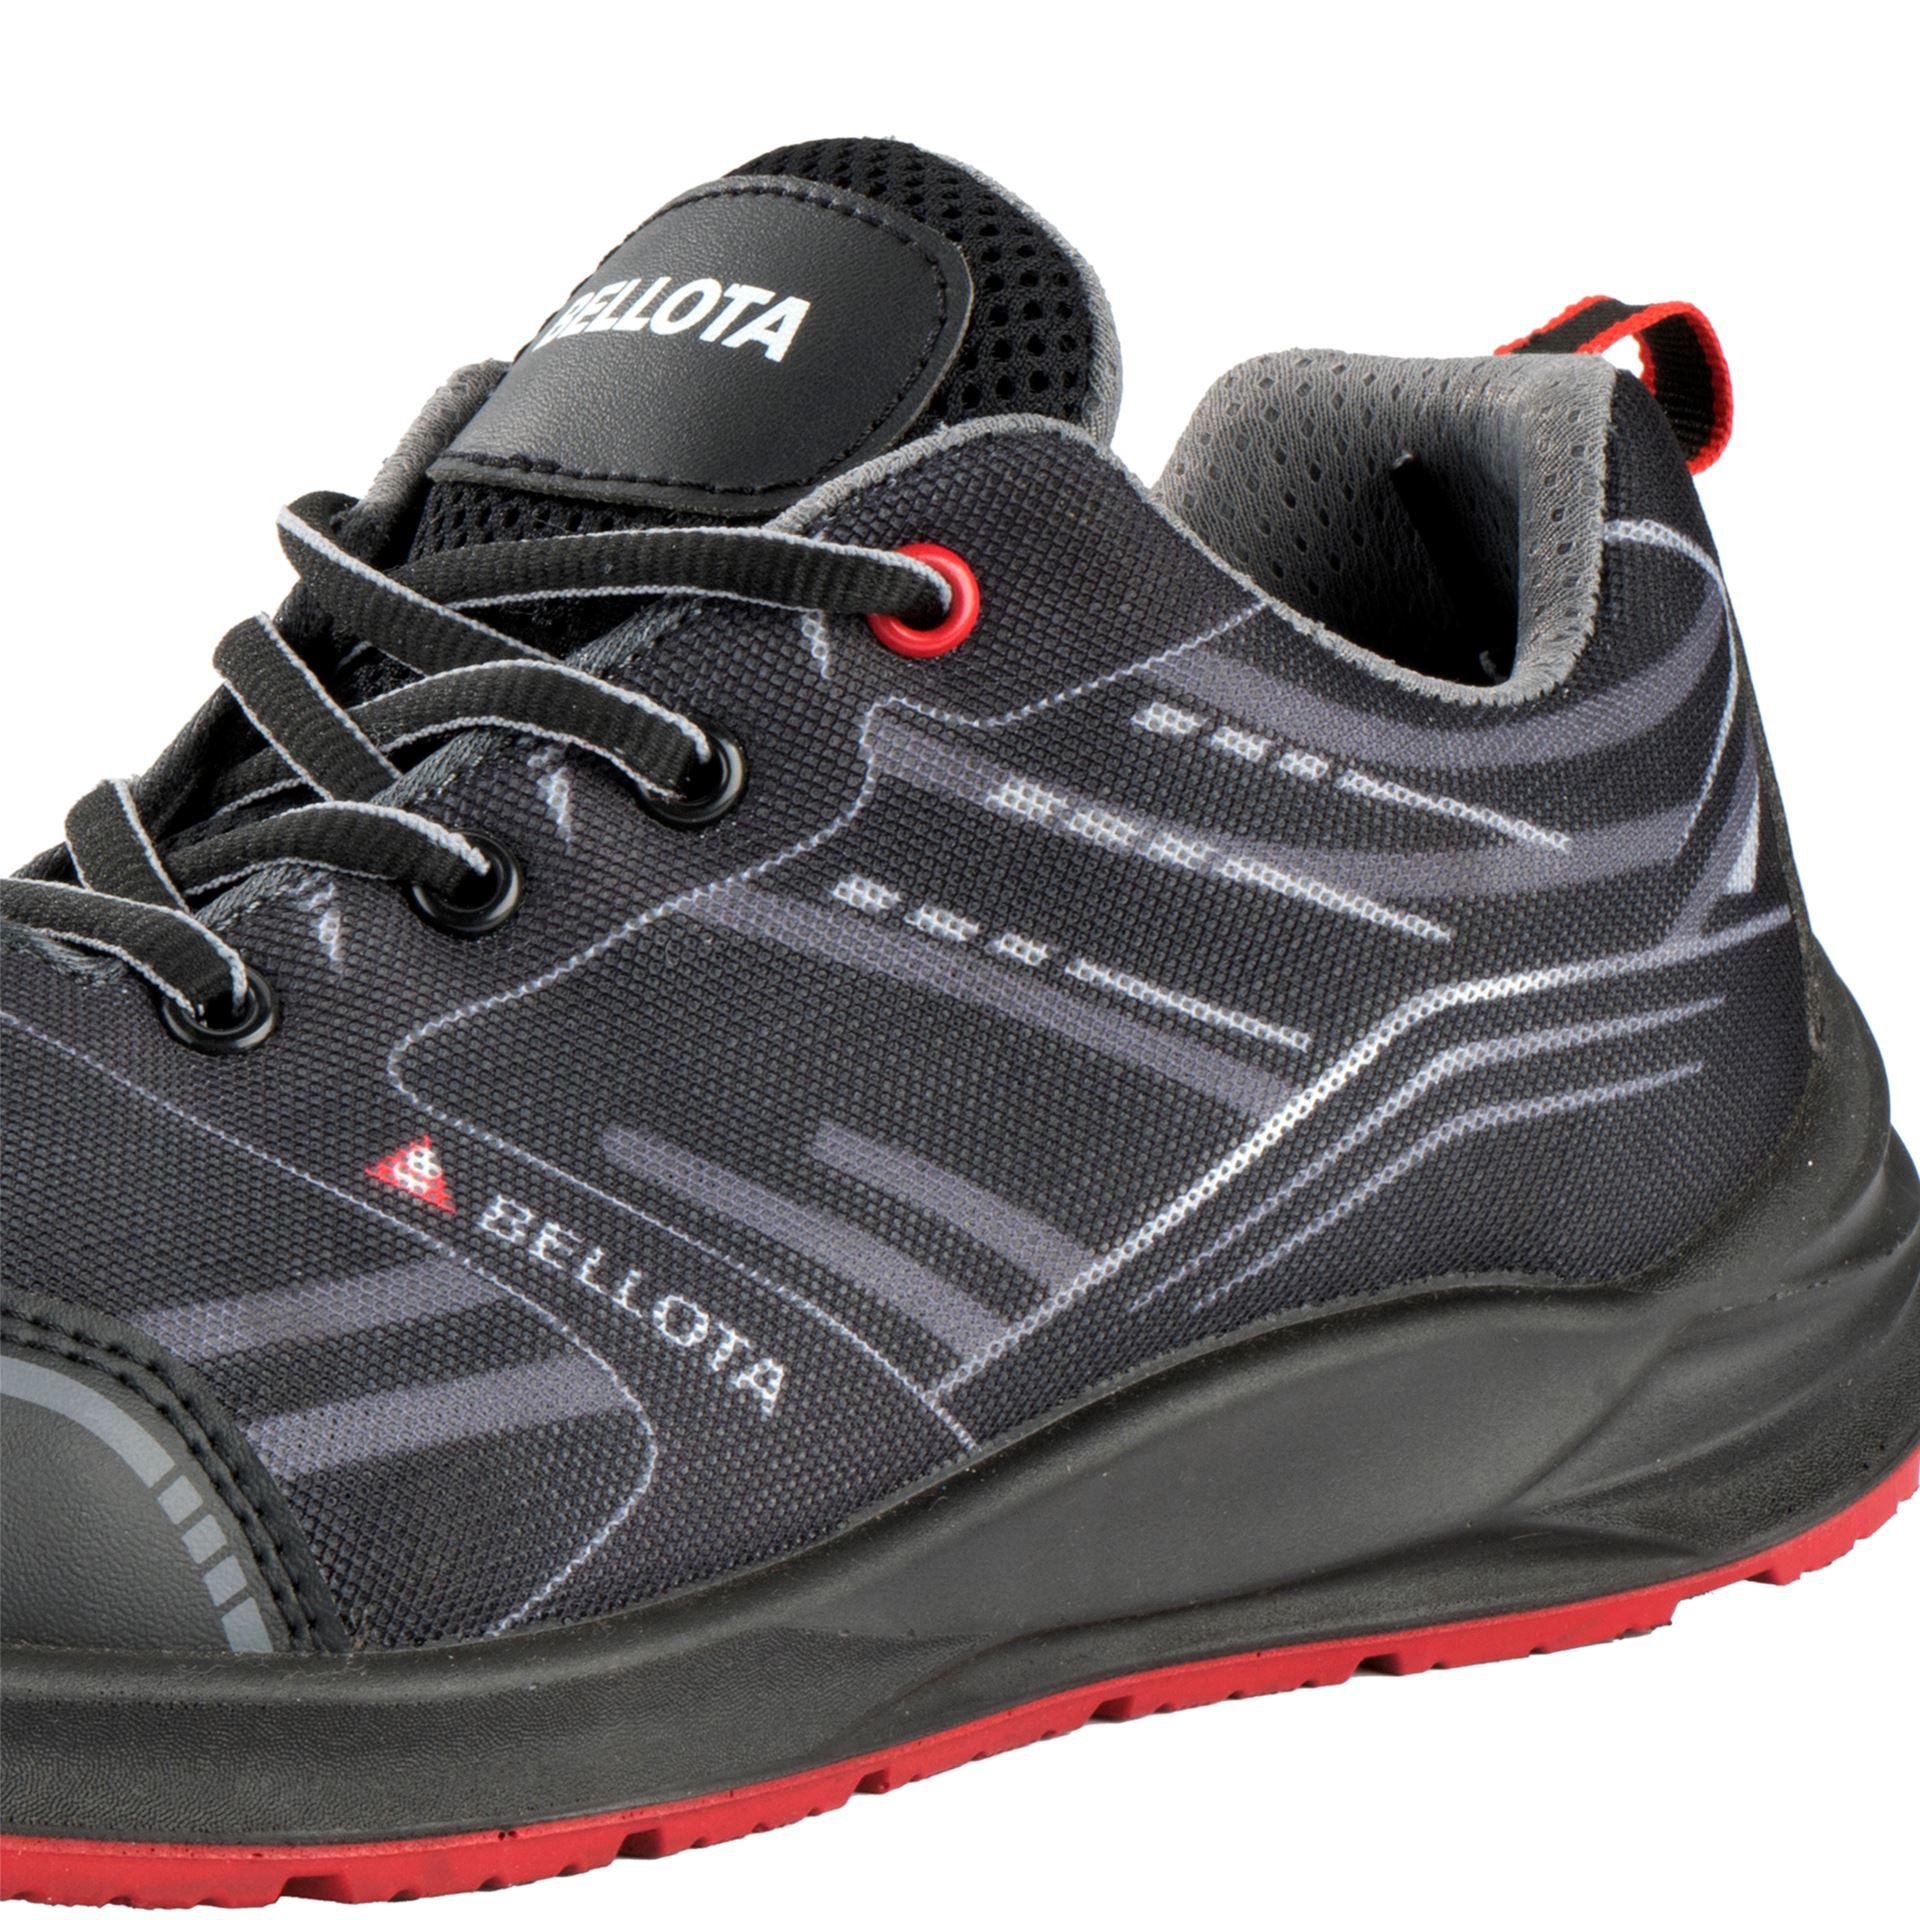 Imagen de Zapato seguridad S1P Bellota Flex Negro Sport FTW04